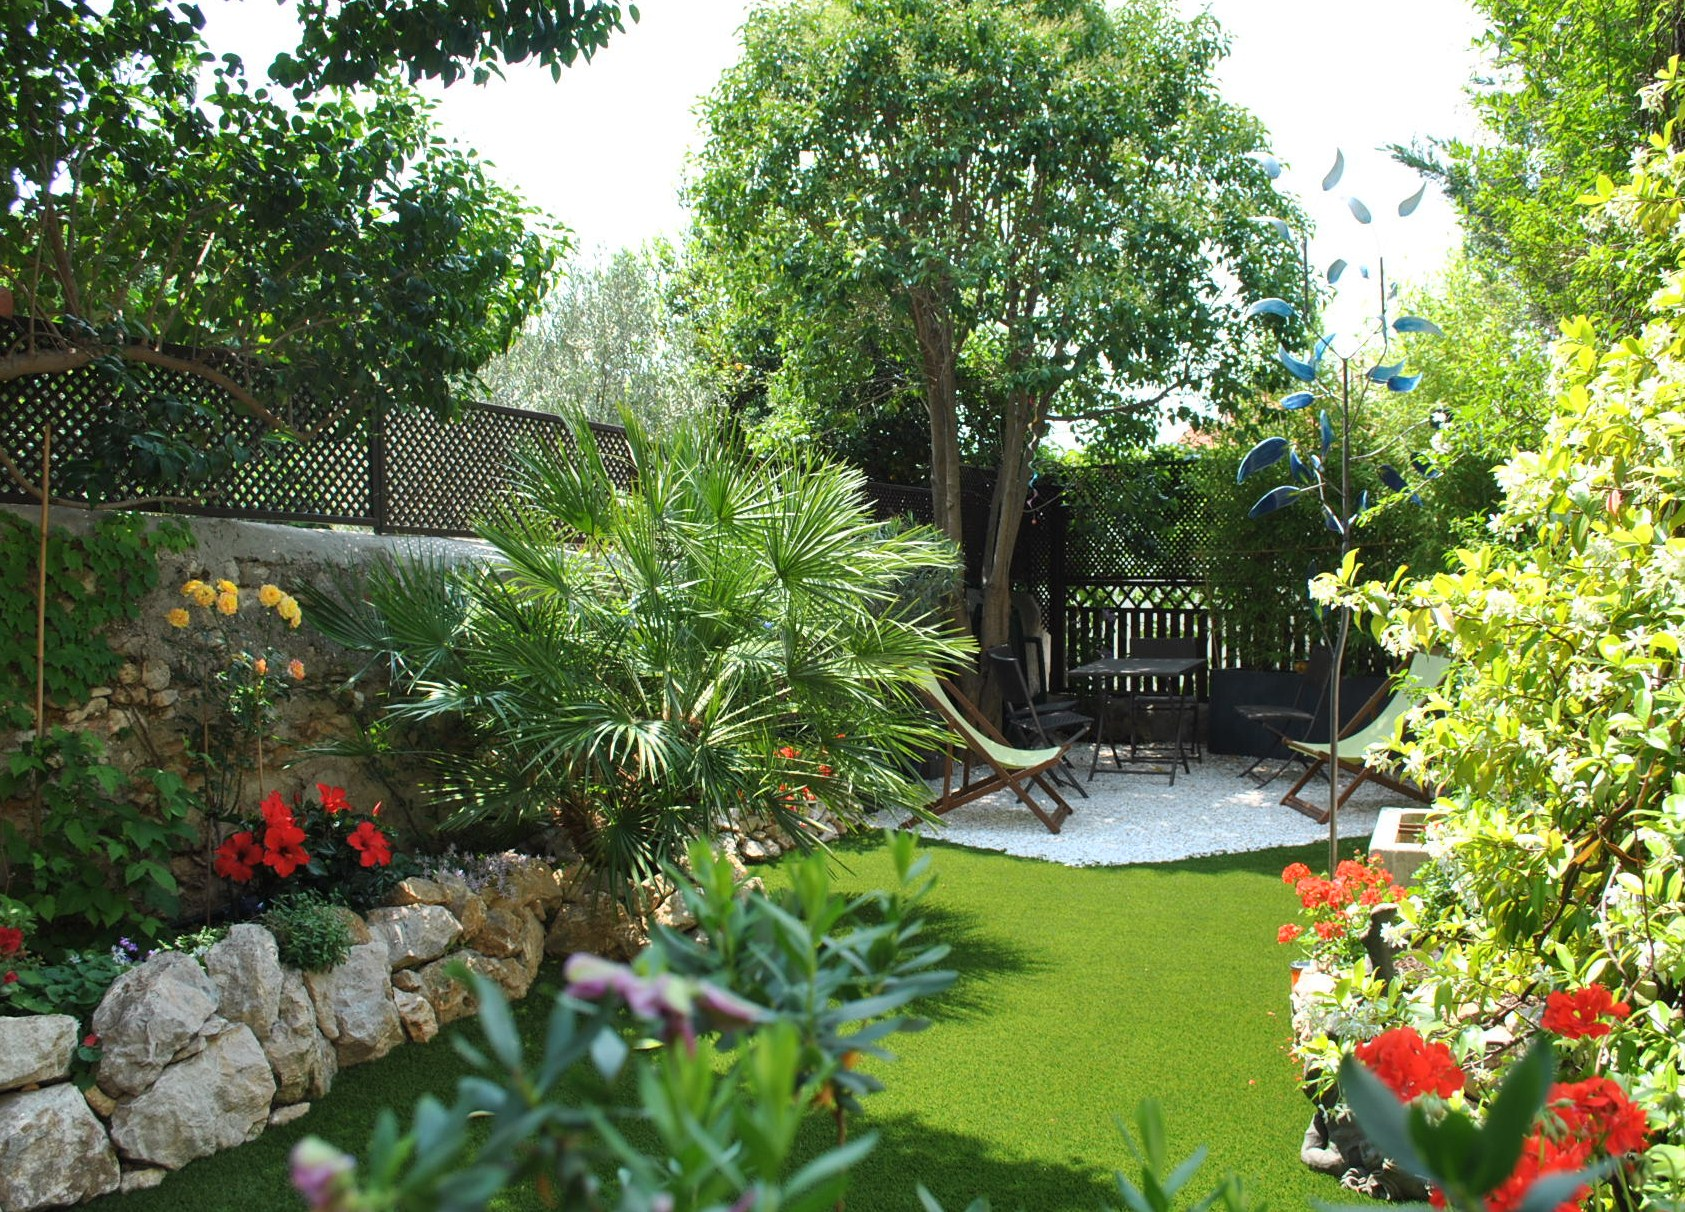 Le petit jardin marseille 7e arrondissement for Le petit jardin